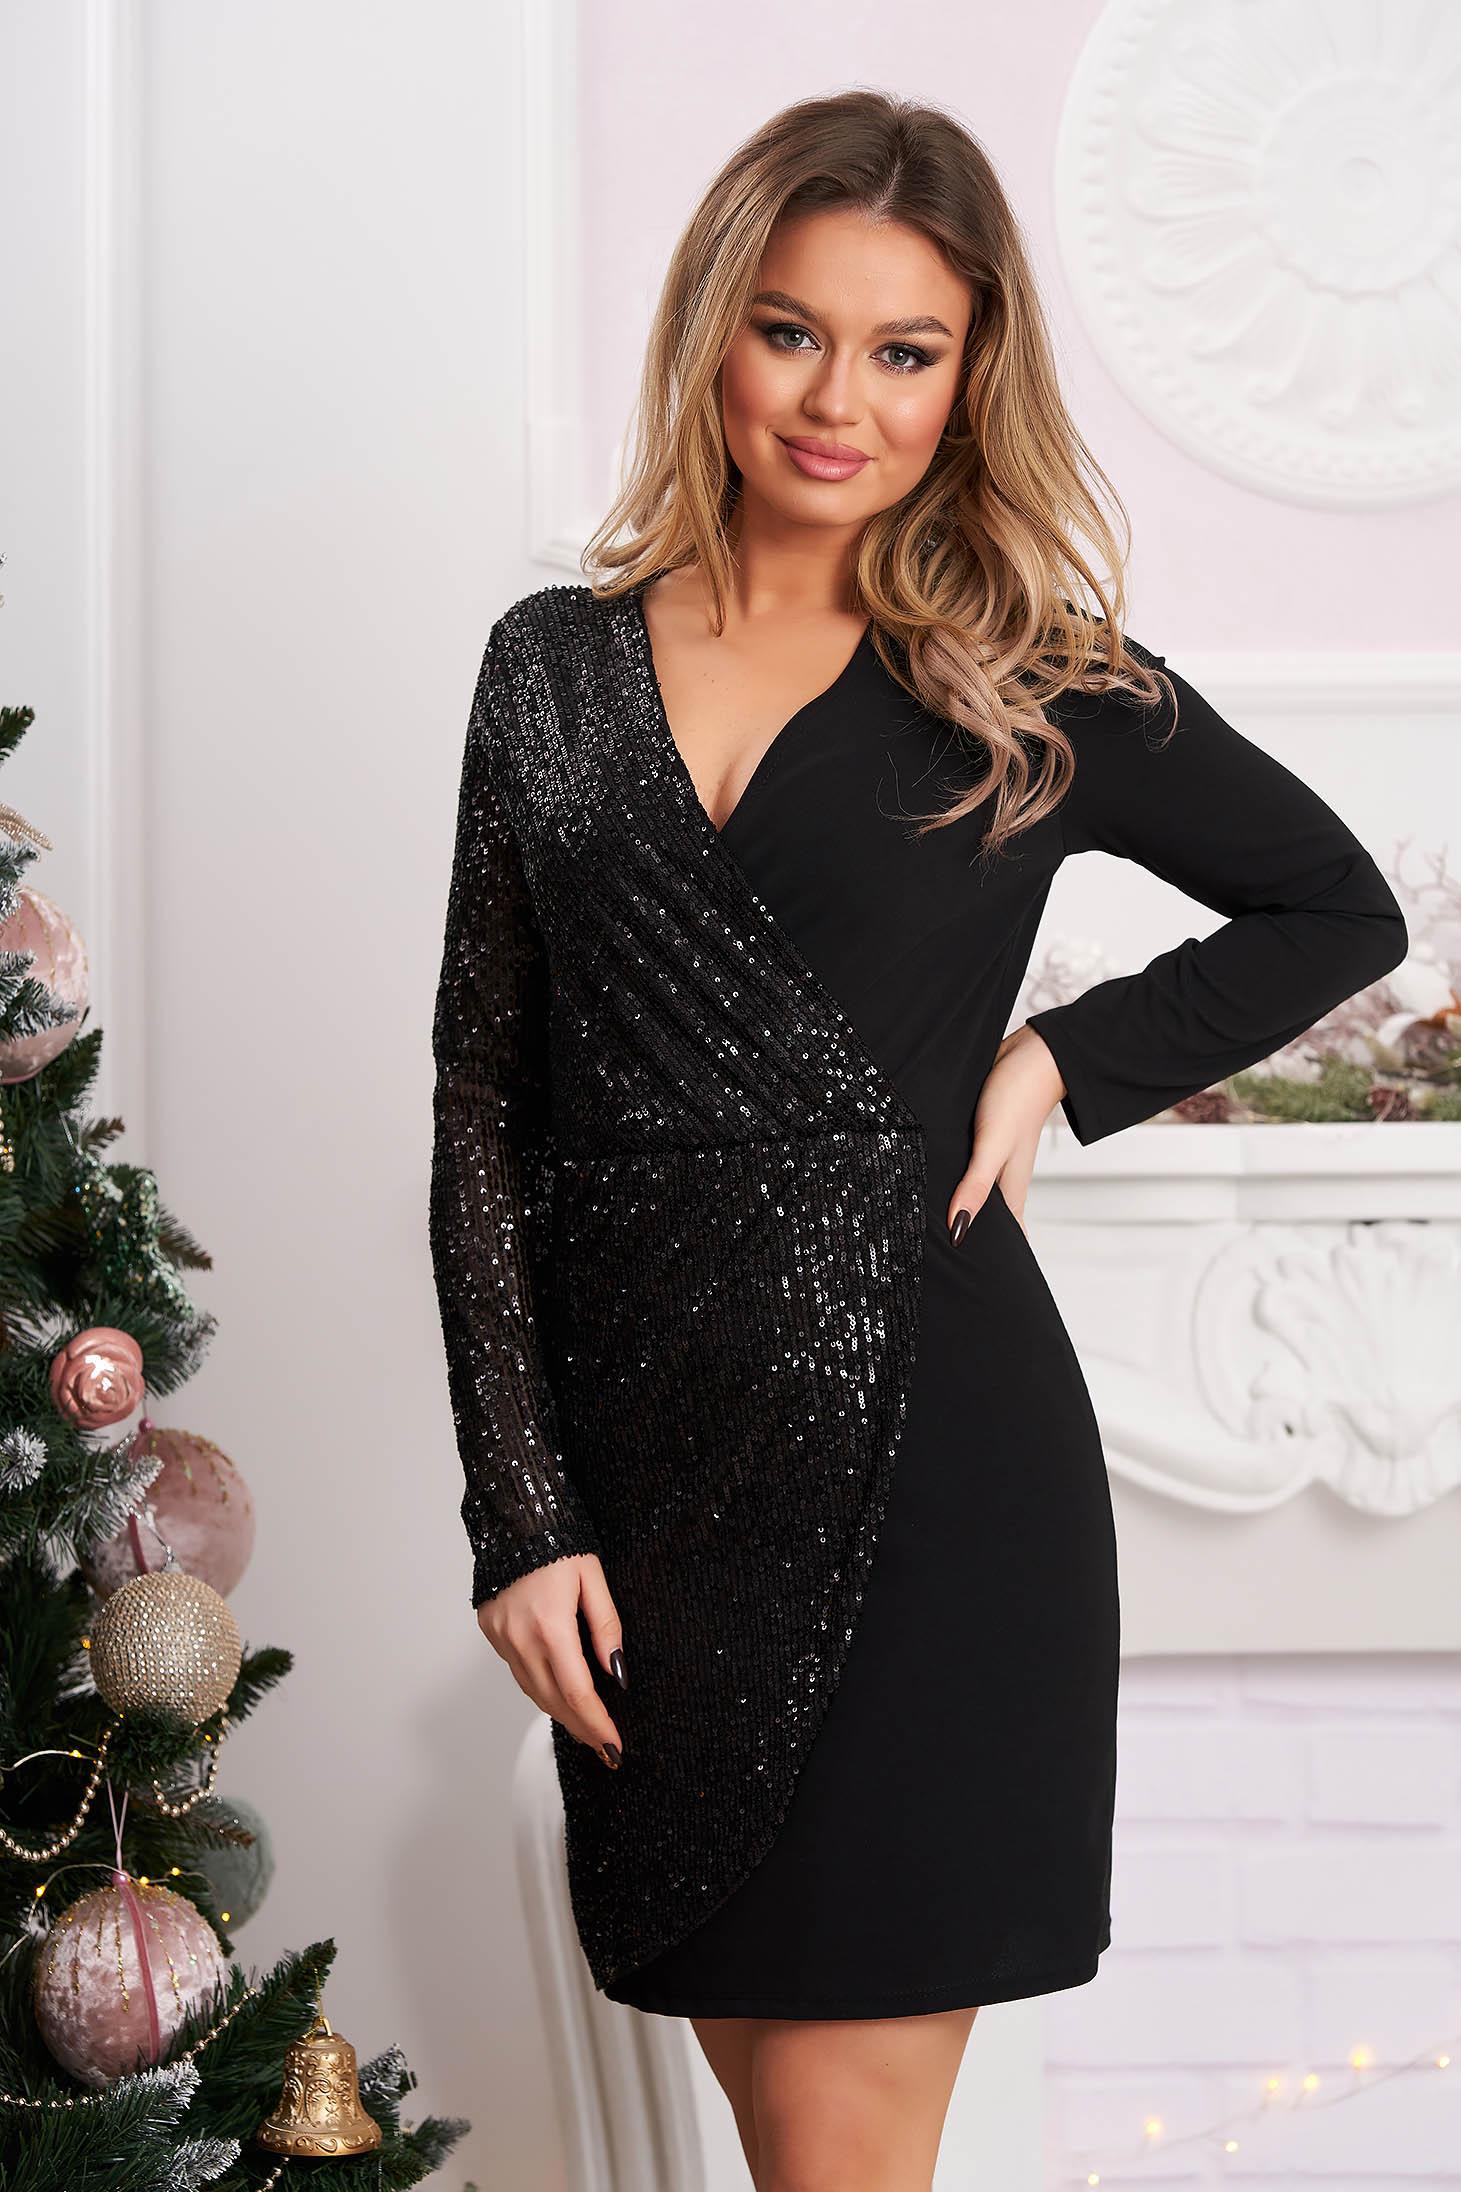 Black dress short cut occasional pencil cloth with sequins